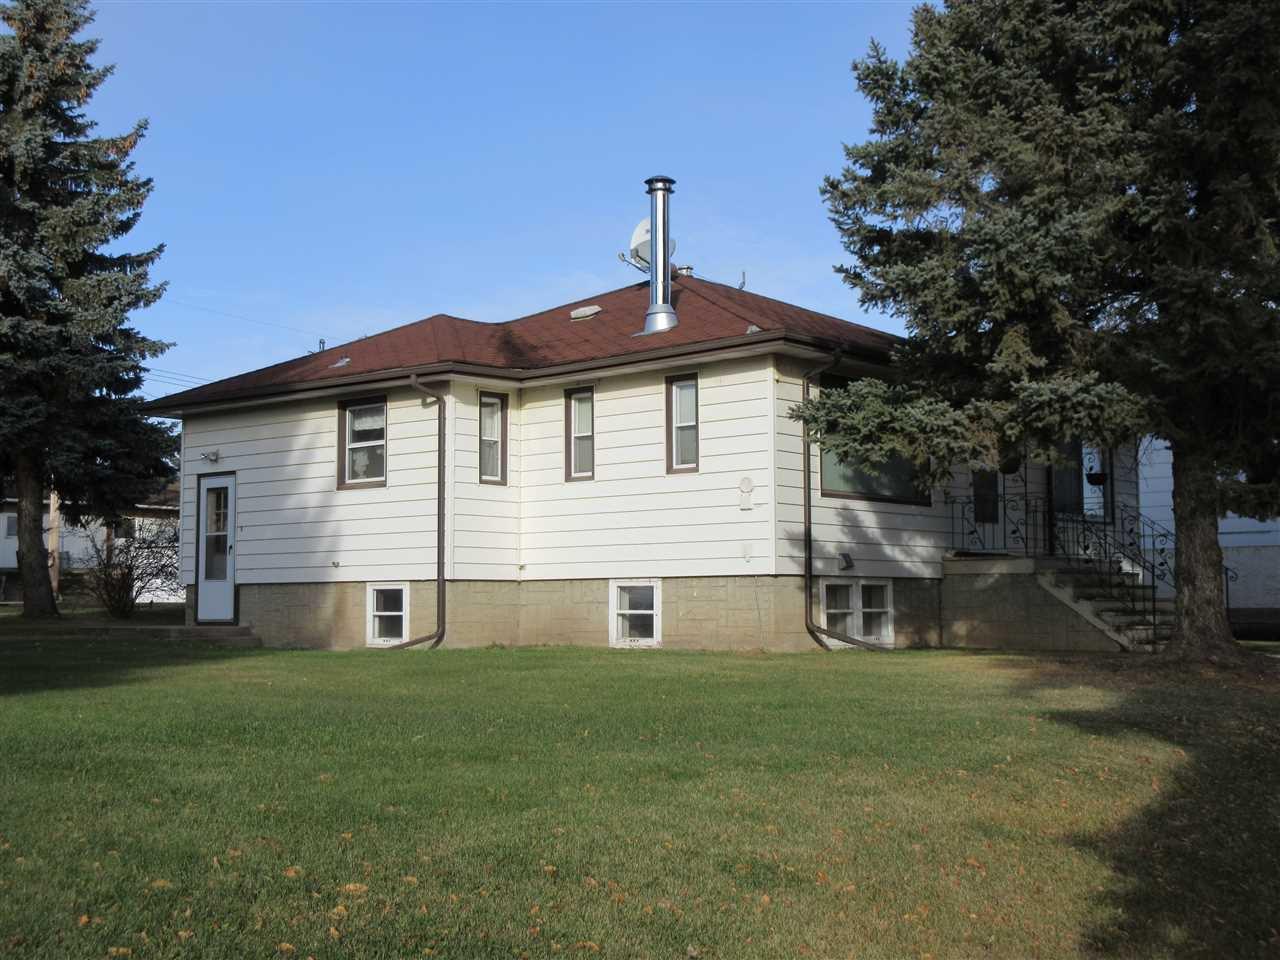 Main Photo: 418 3 Street: Thorhild House for sale : MLS®# E4178166